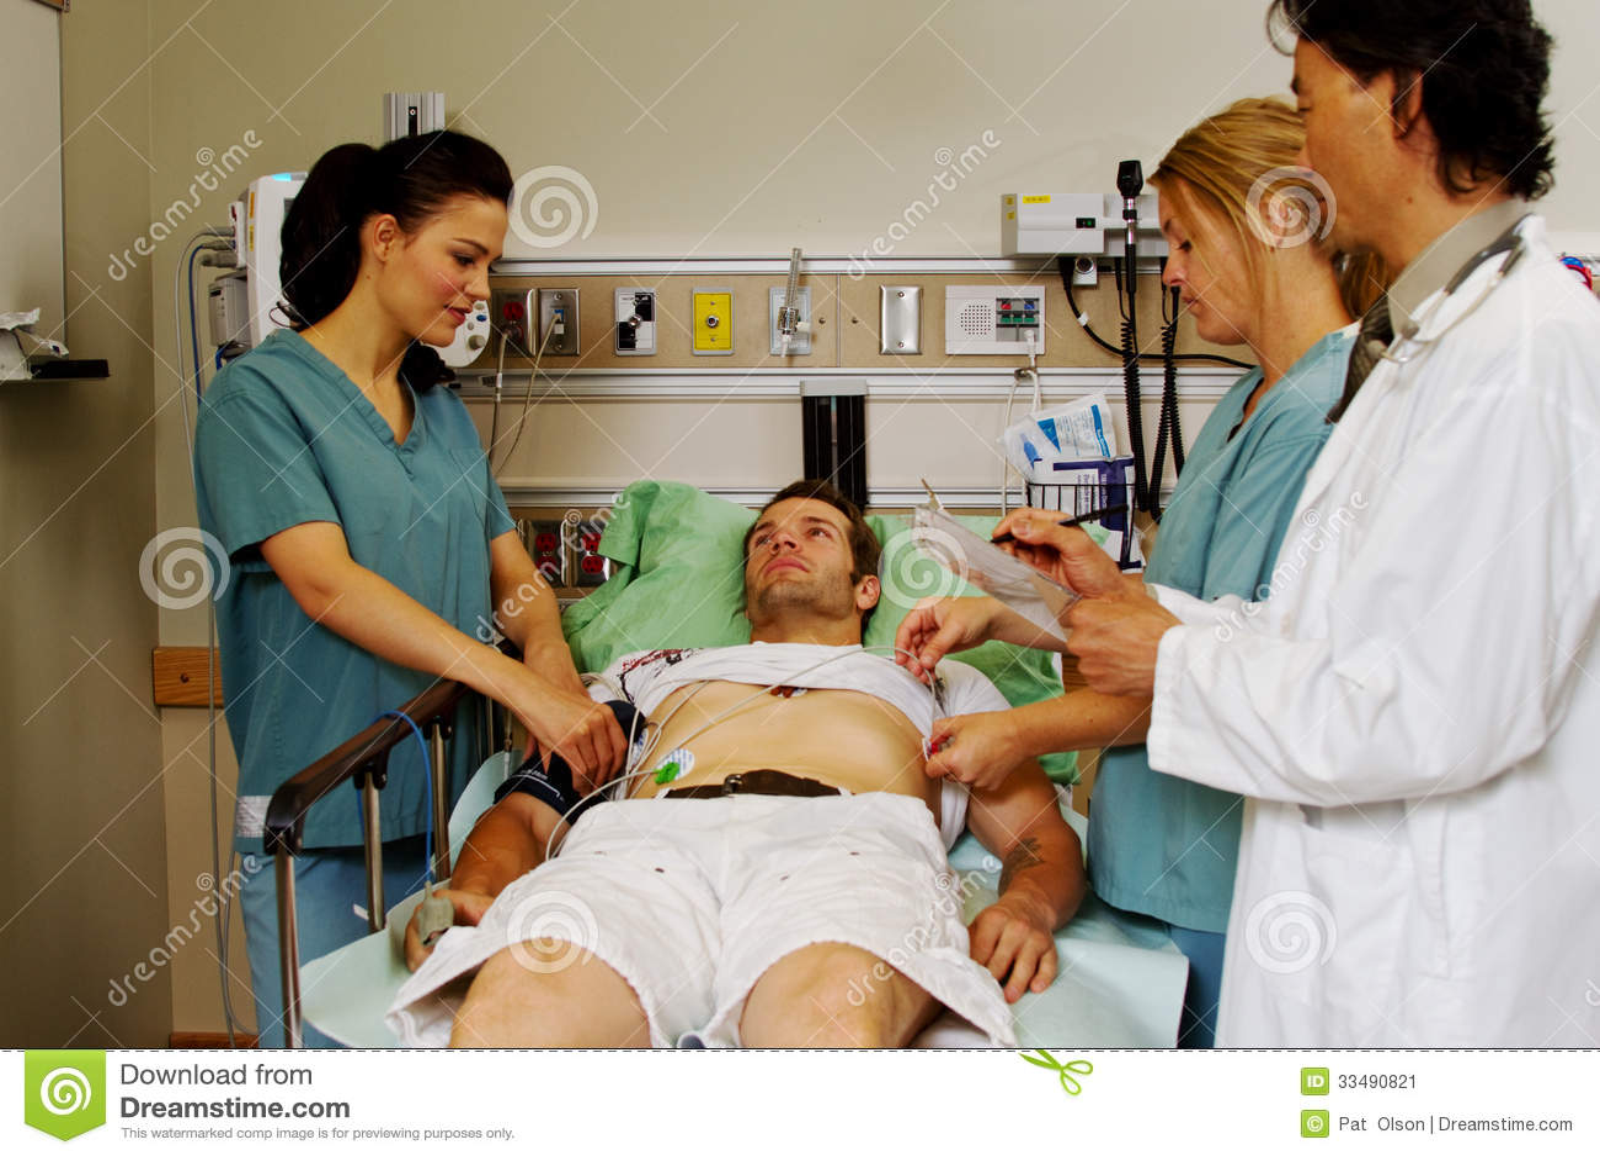 Adult male exam medical foreskin uncut 3